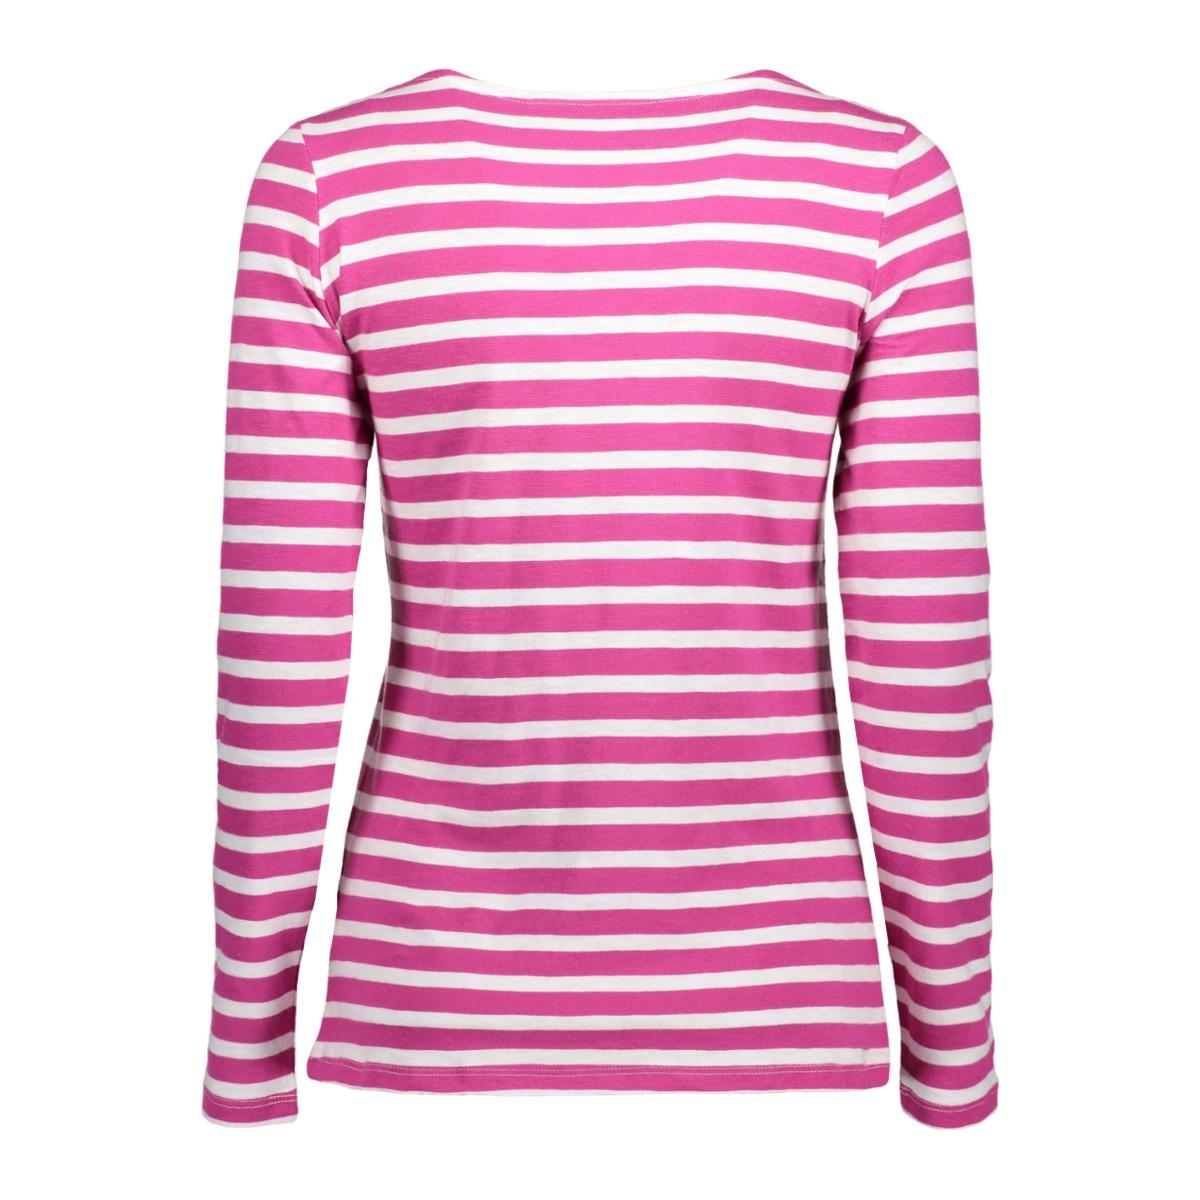 j70214 garcia t-shirt 39 fuchsia